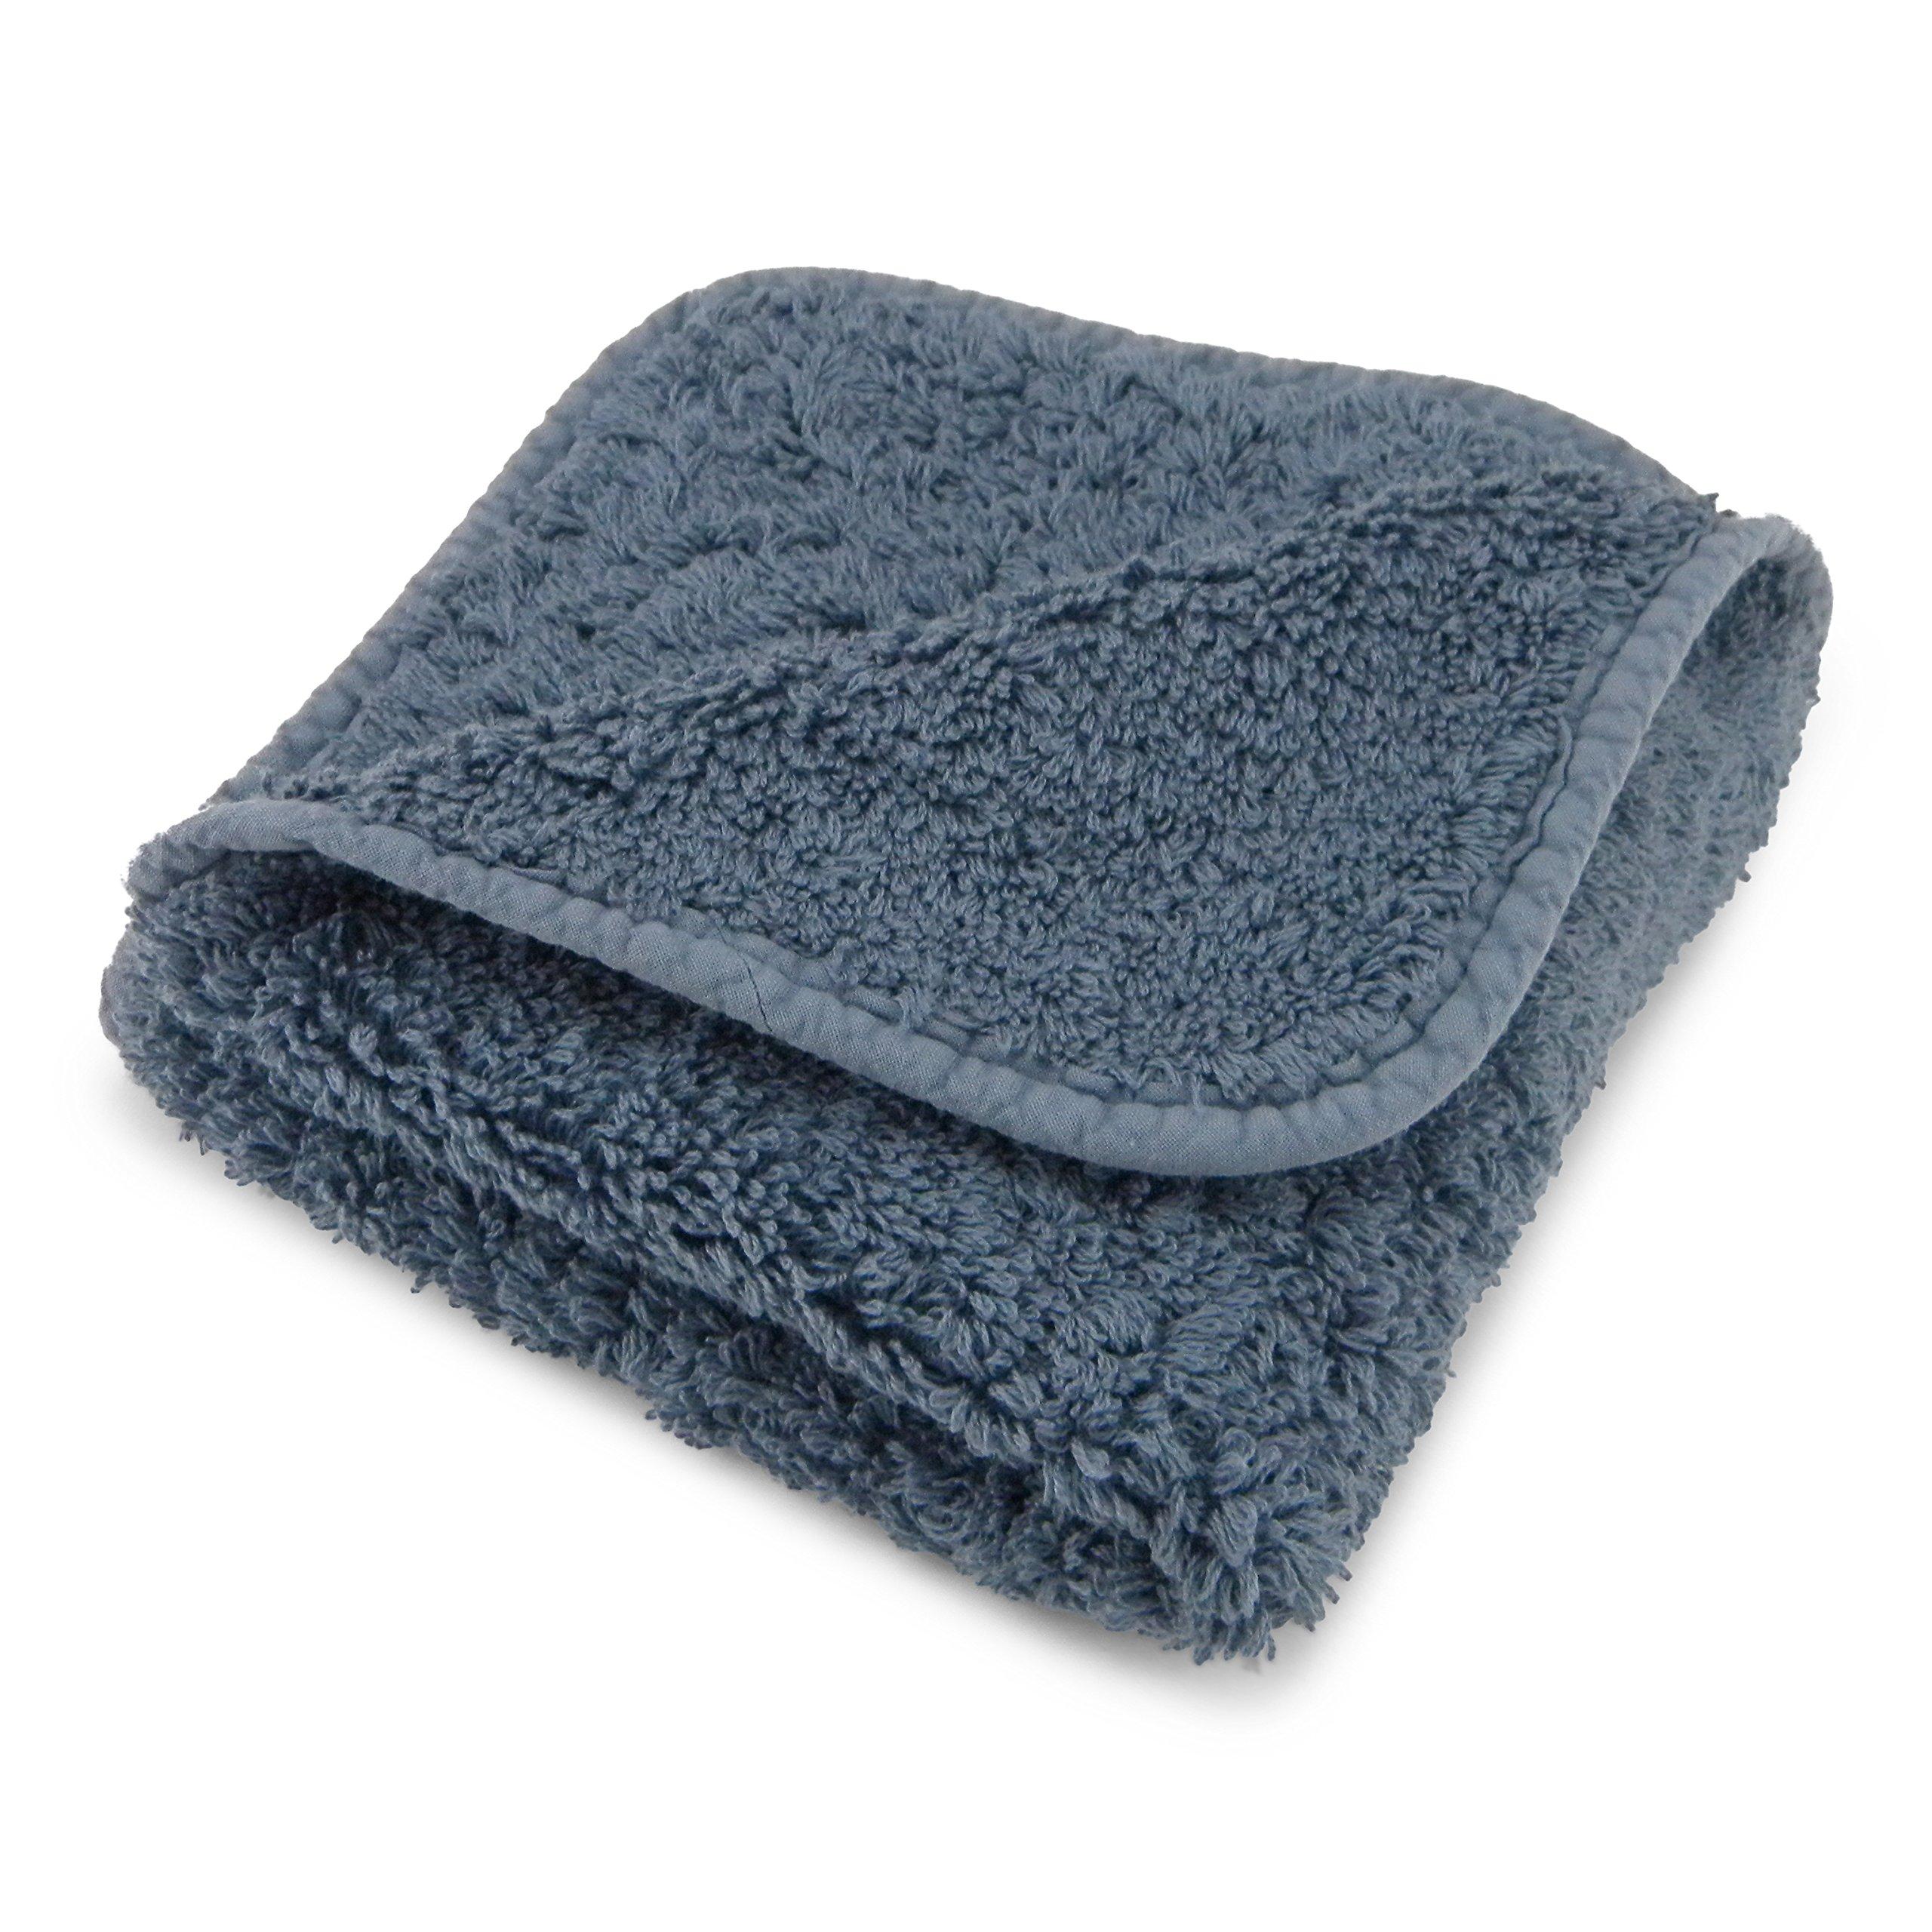 Abyss Super Pile Bath Sheet (40''x 72'') - Bluestone (306)